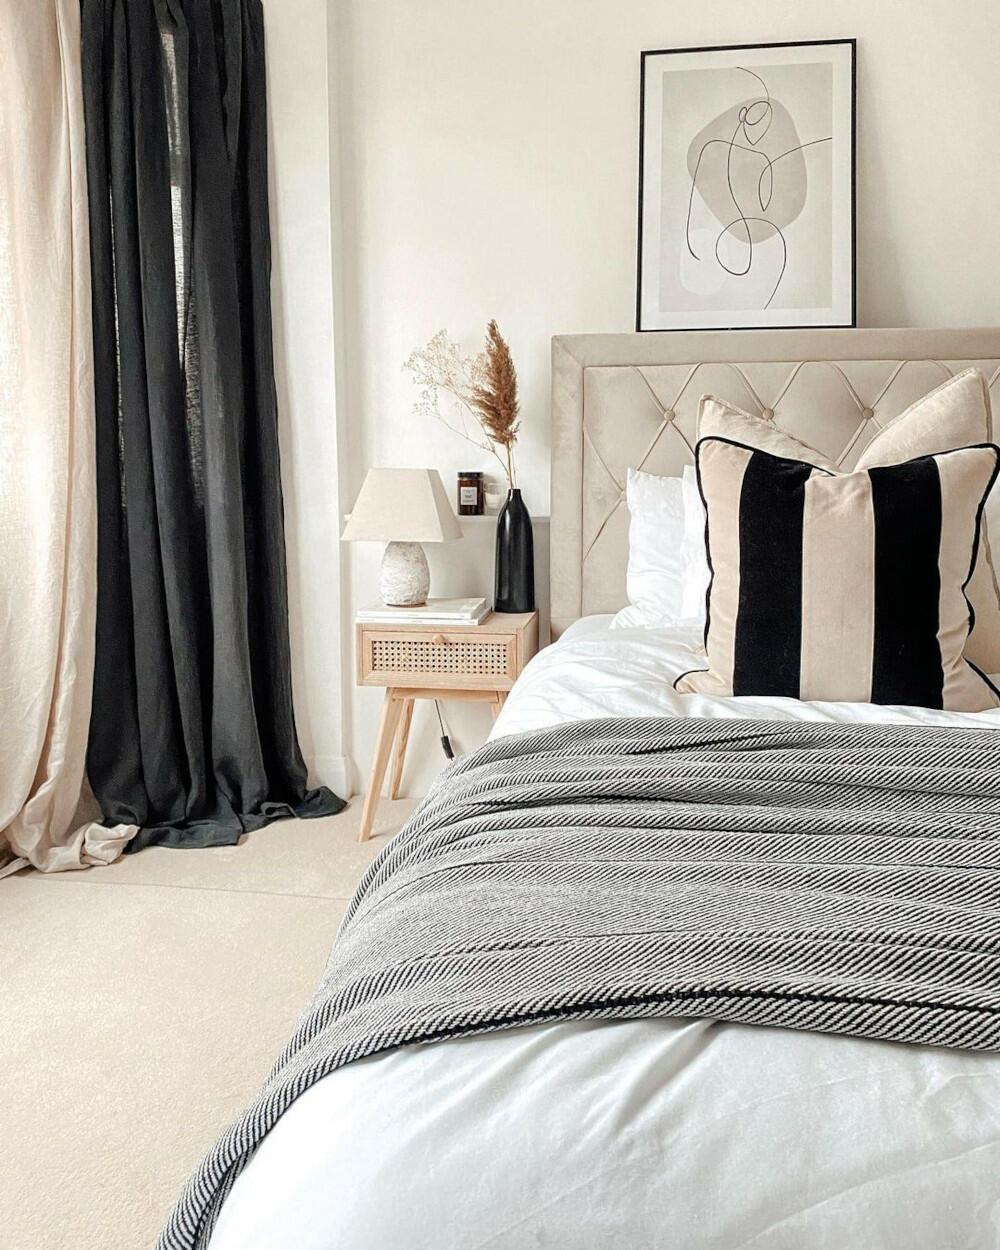 Woodbury Warm Stone Bed